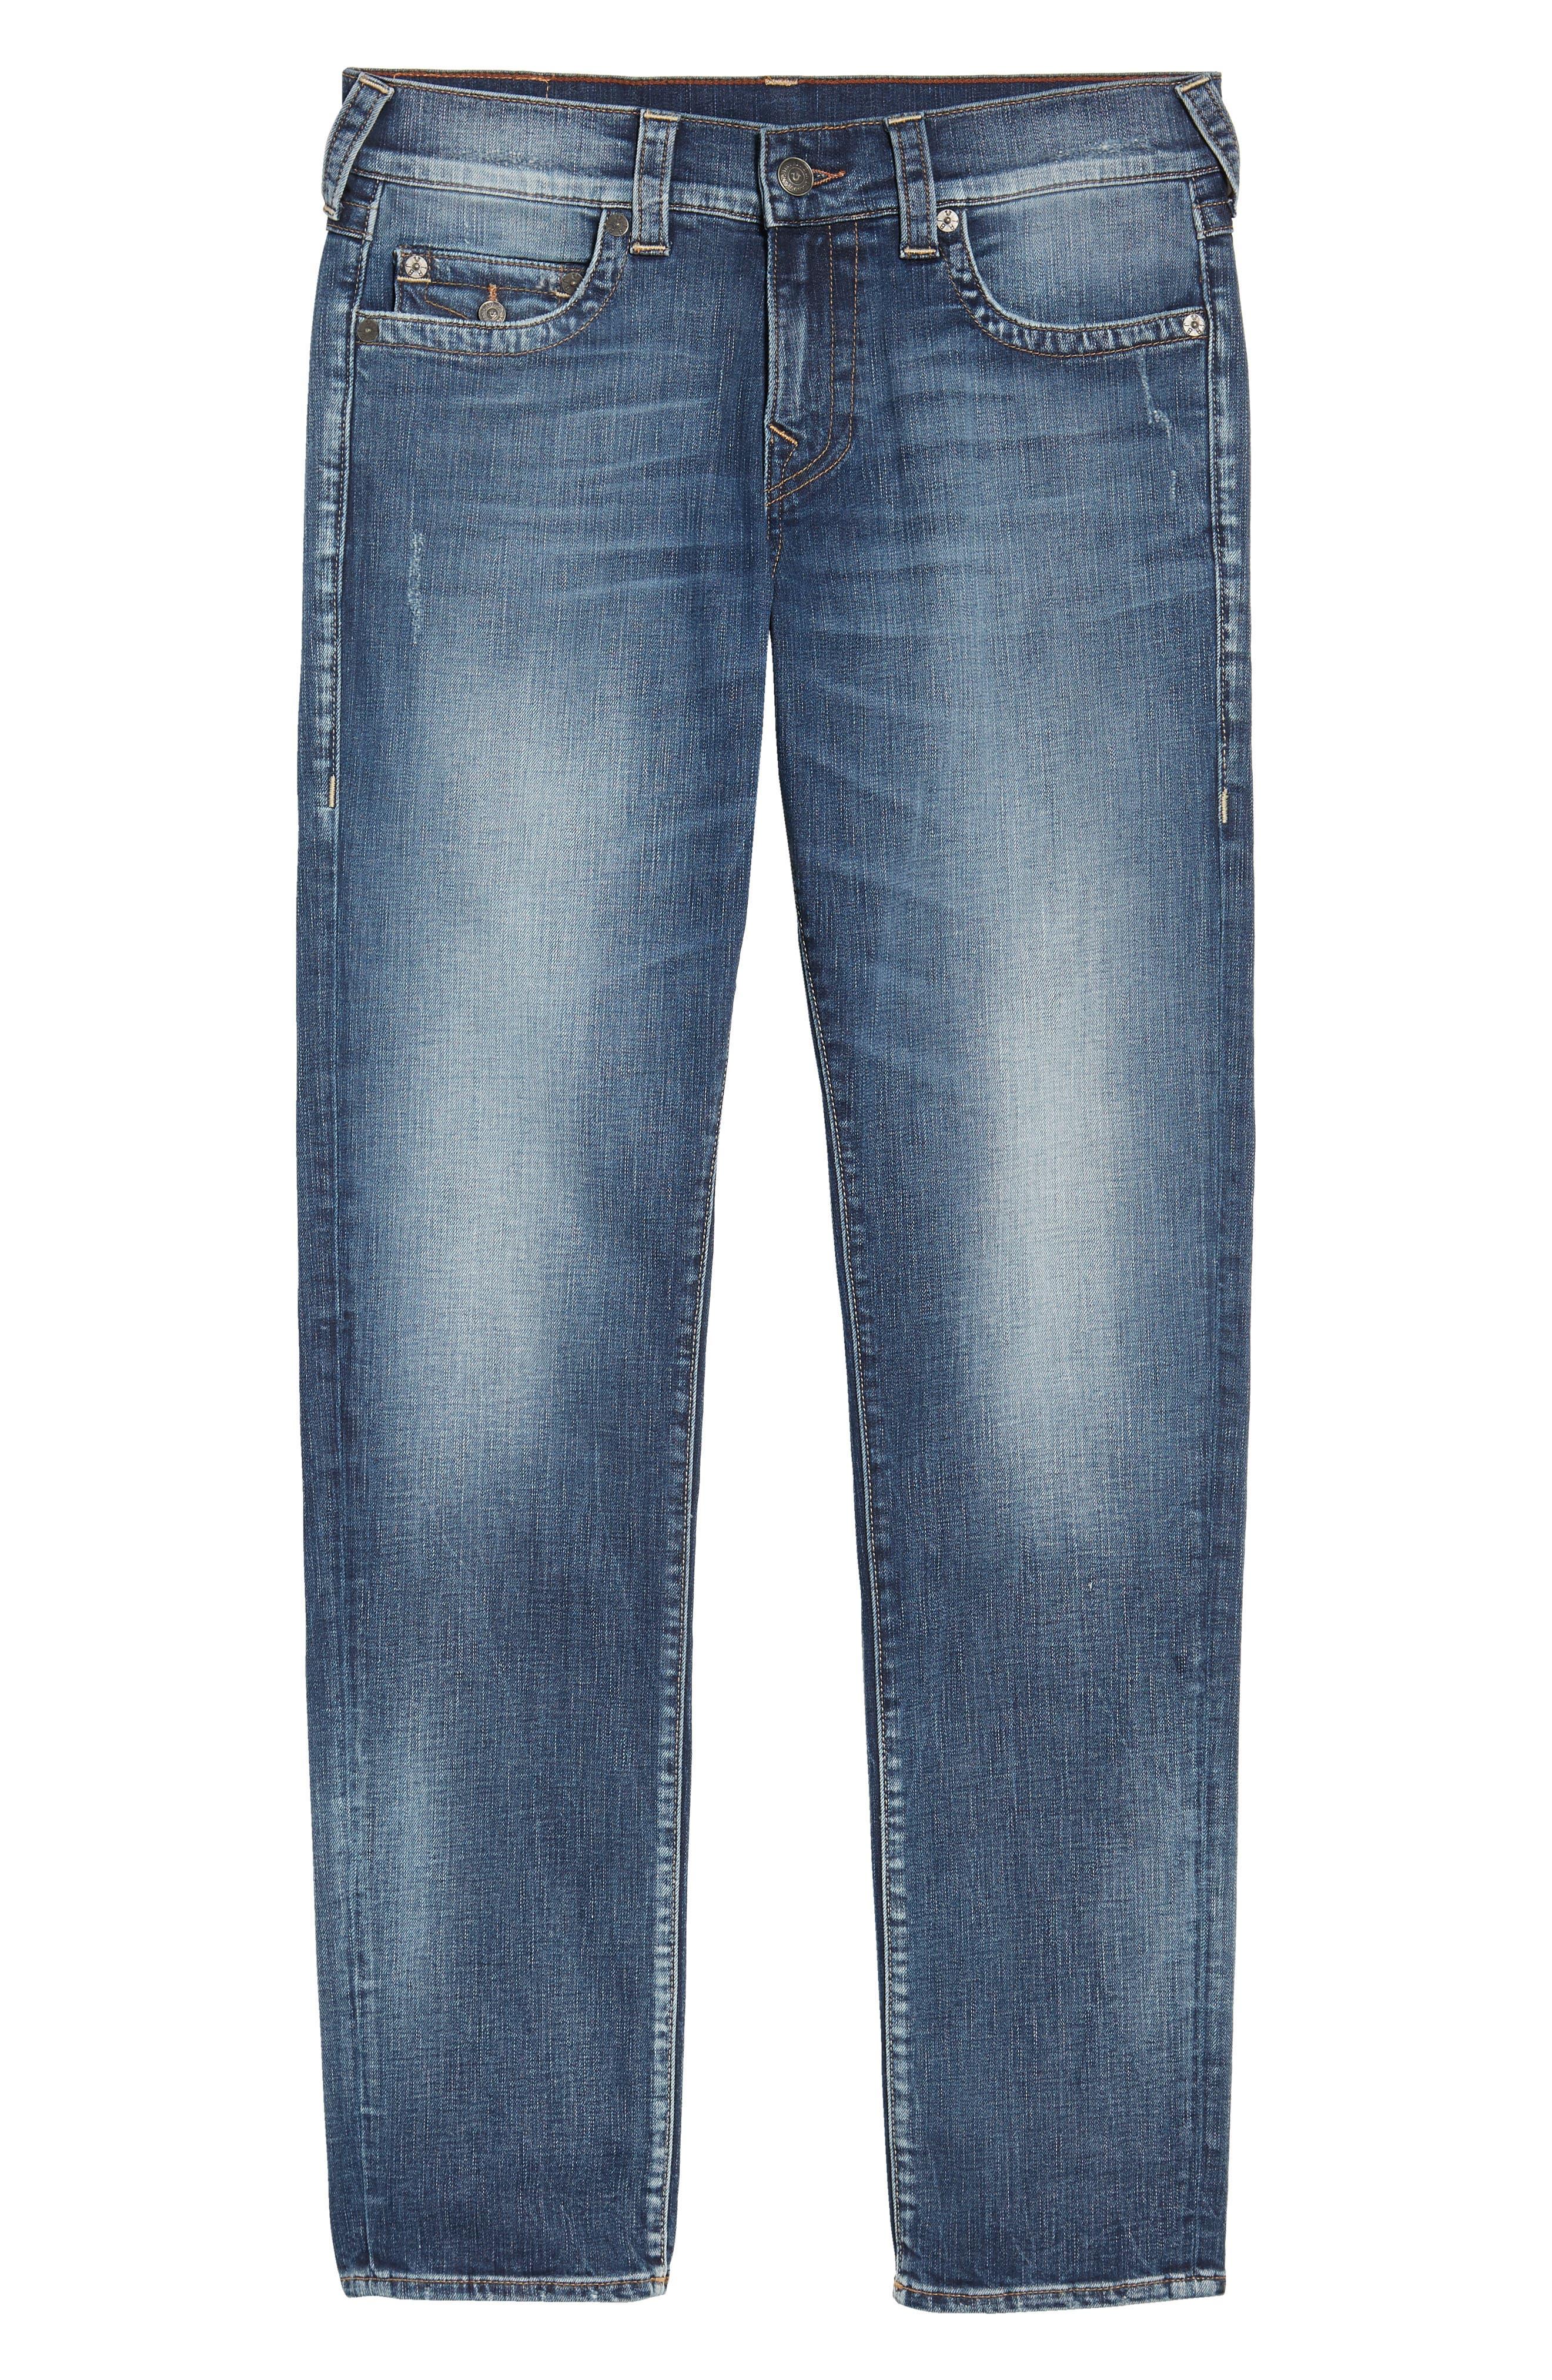 Geno Straight Leg Jeans,                             Alternate thumbnail 6, color,                             Morning Haze